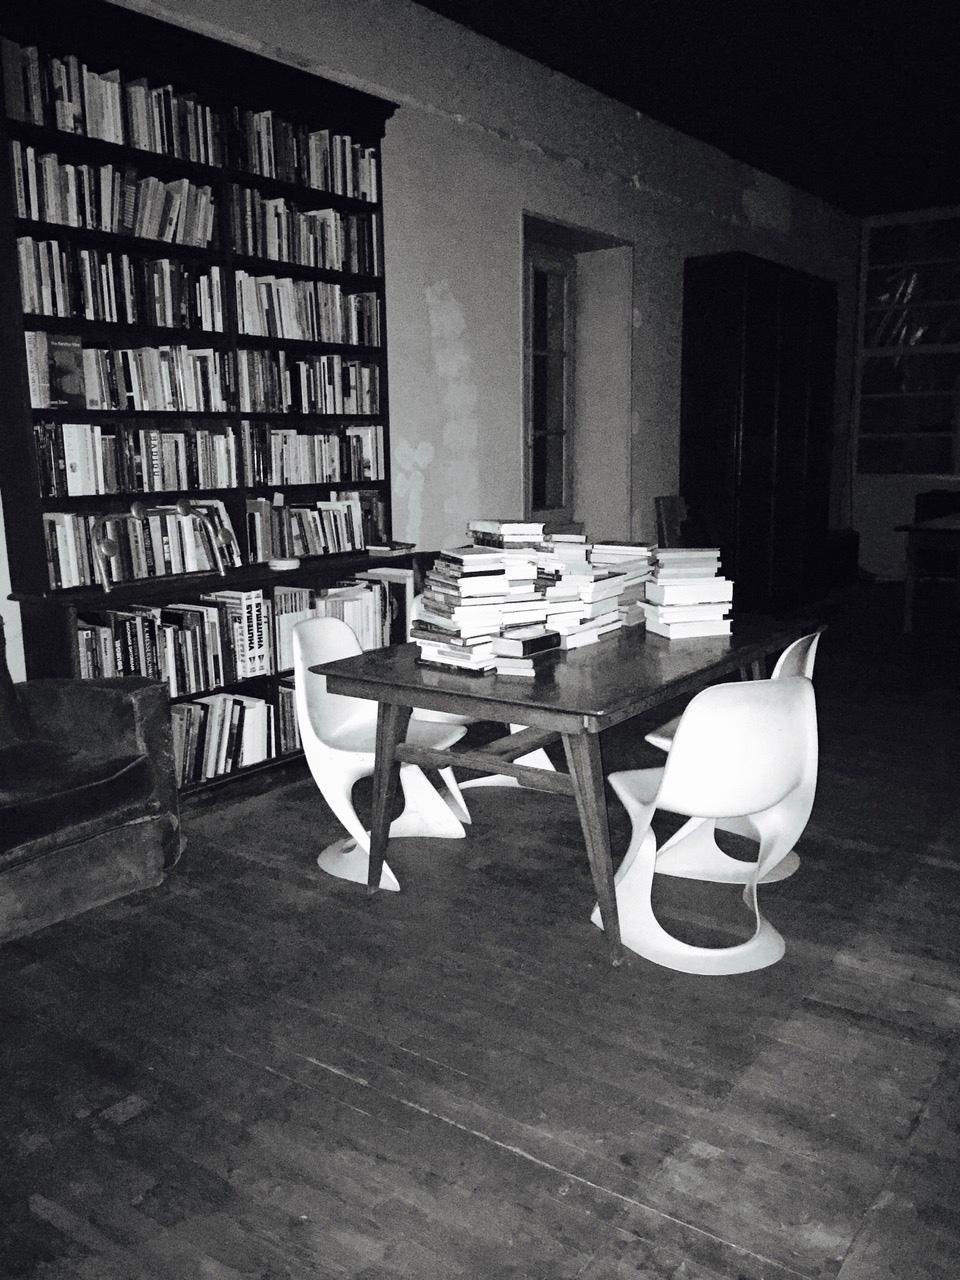 Summer Room Writing Residency - Treignac Projet